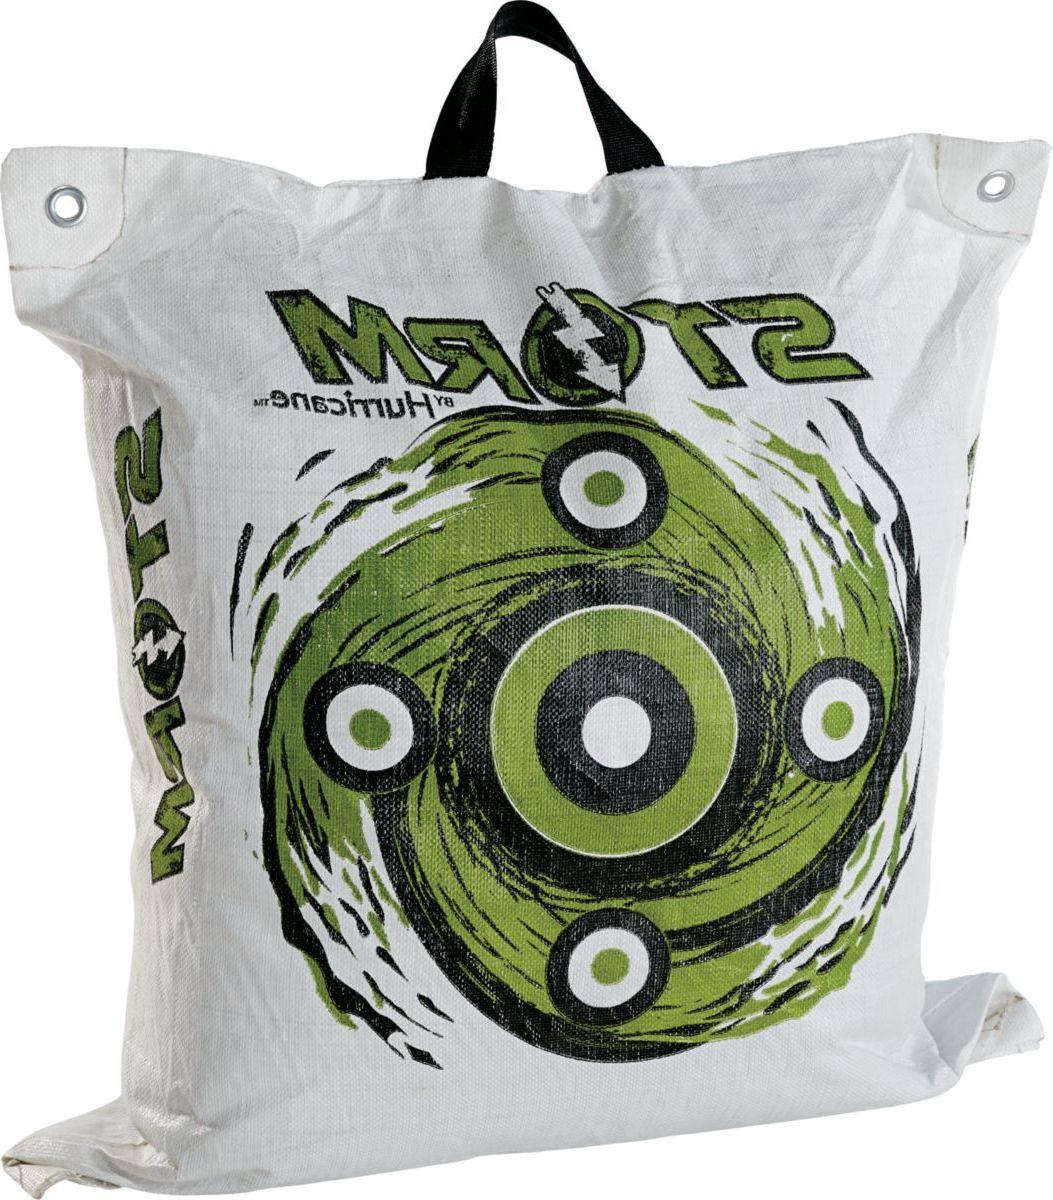 Hurricane Storm 25 Bag Target